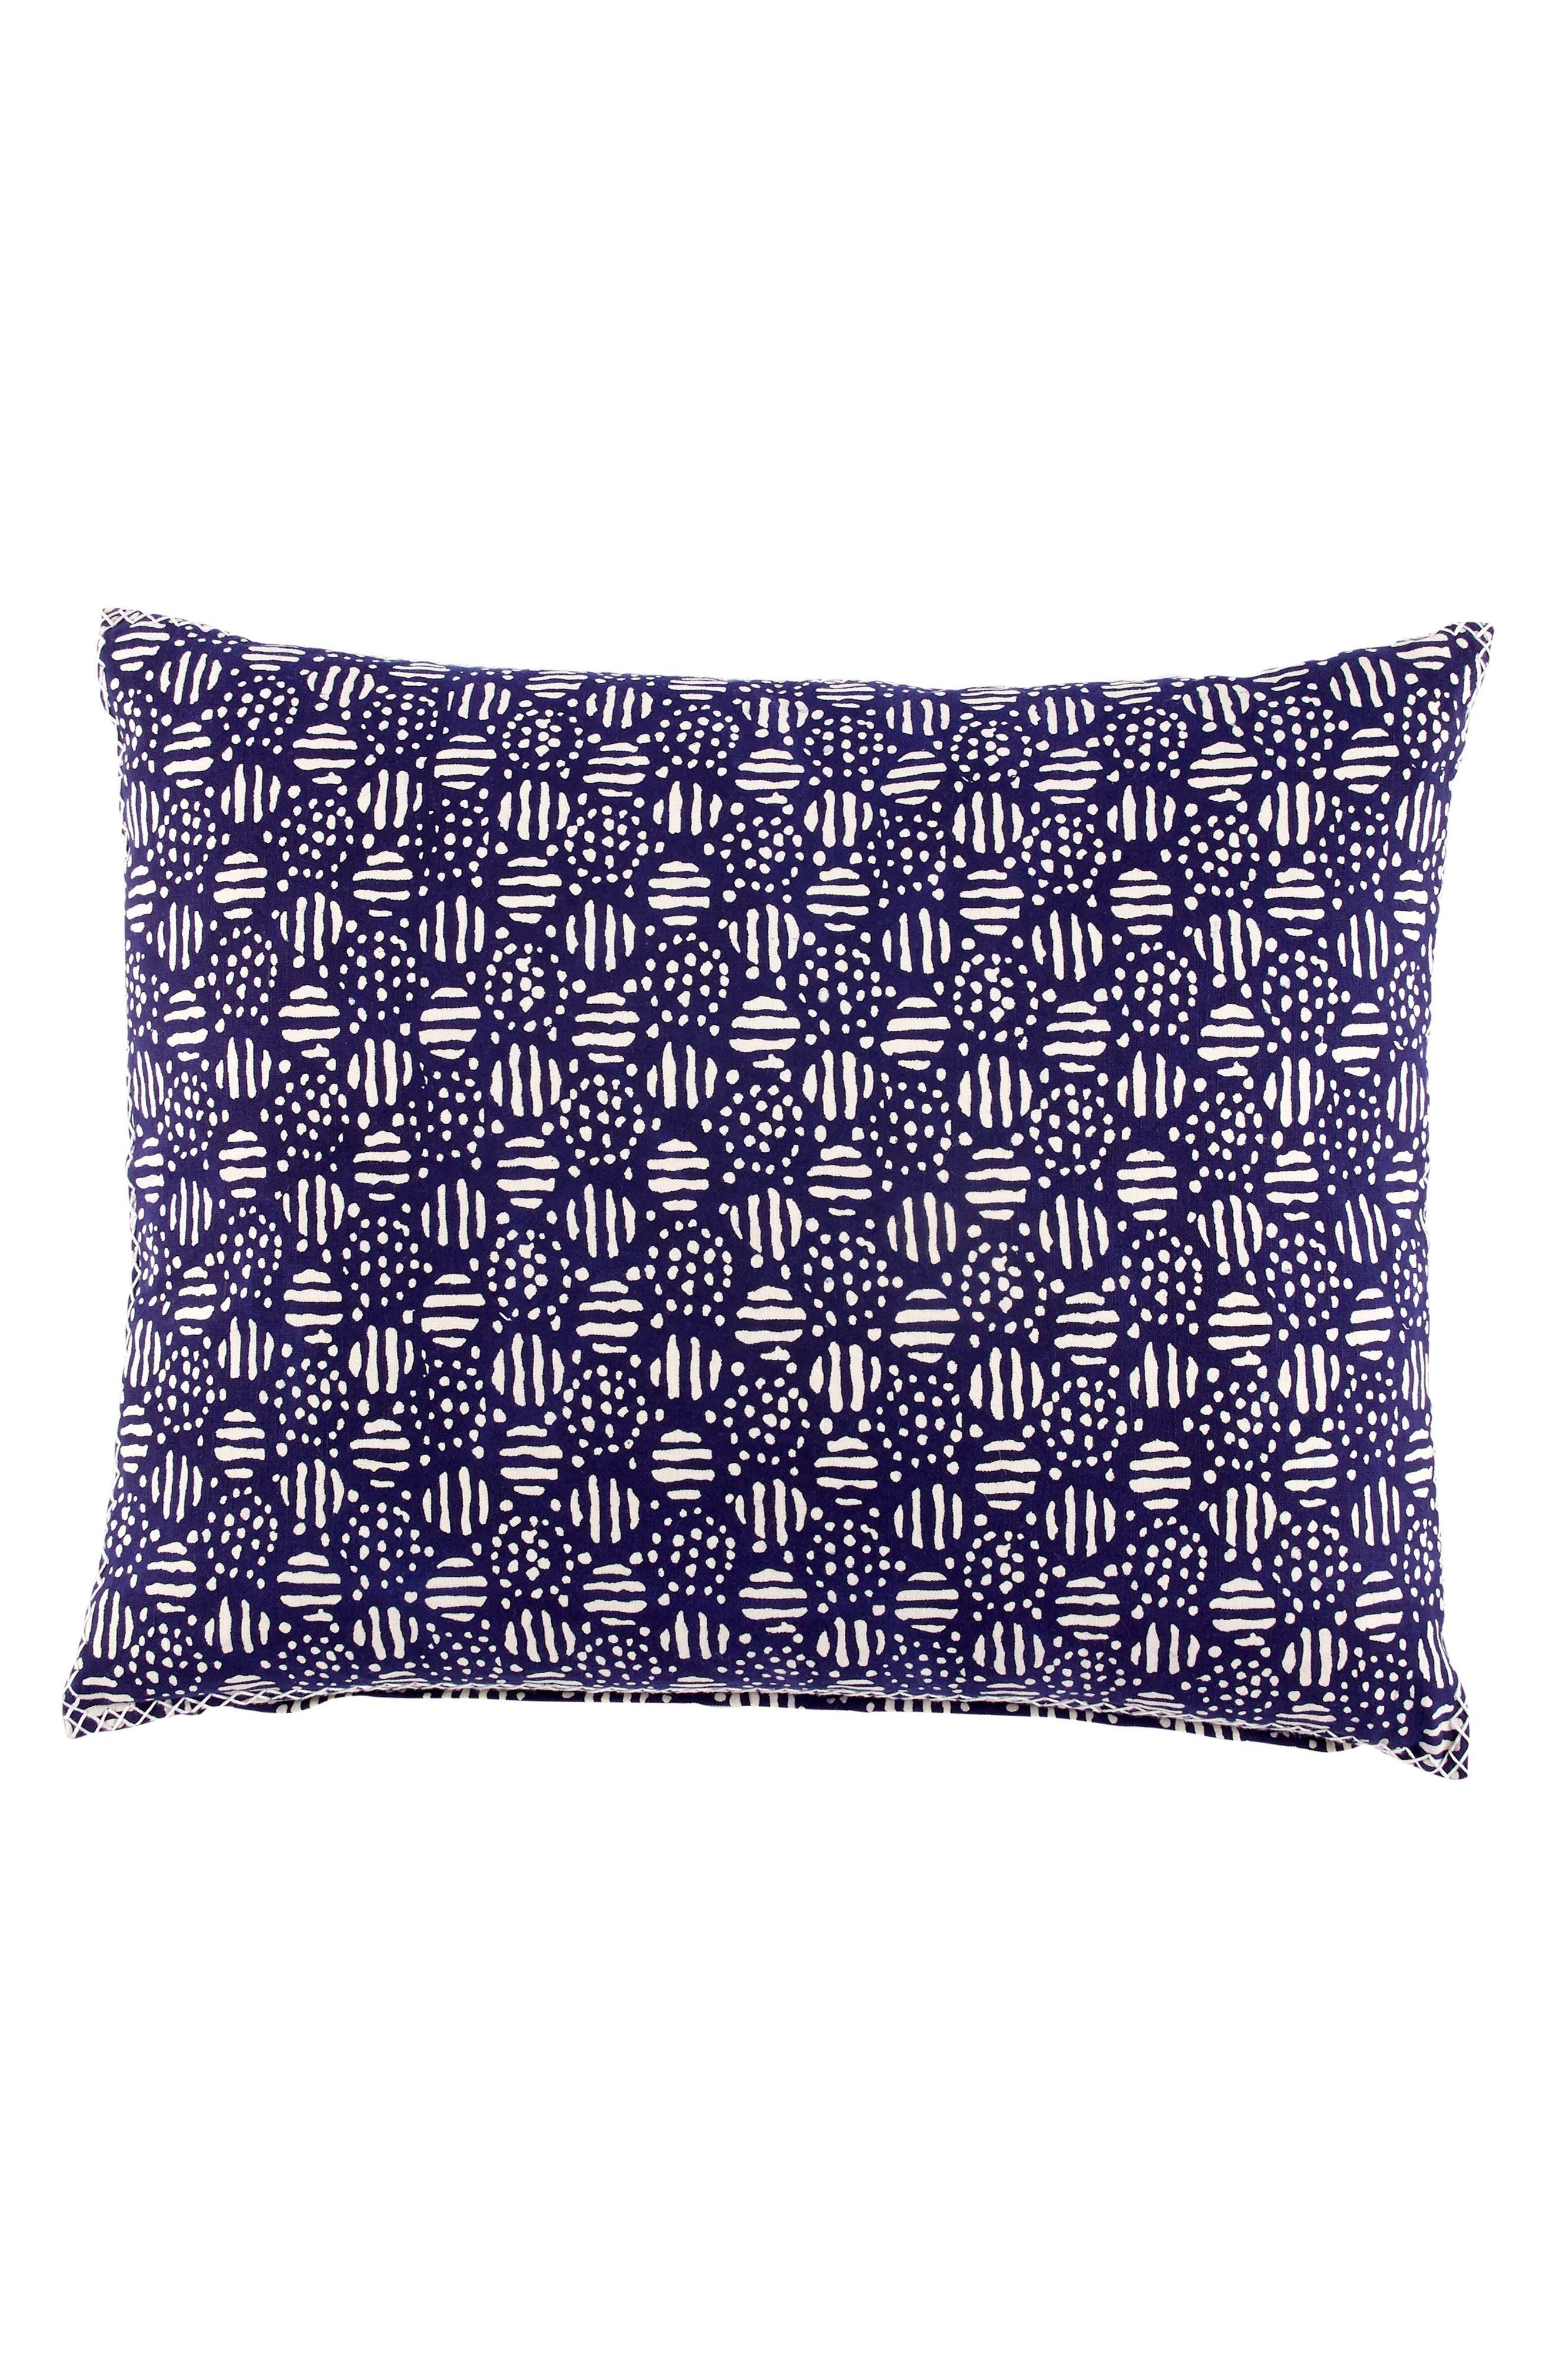 John Robshaw Kimikosa Bolster Accent Pillow